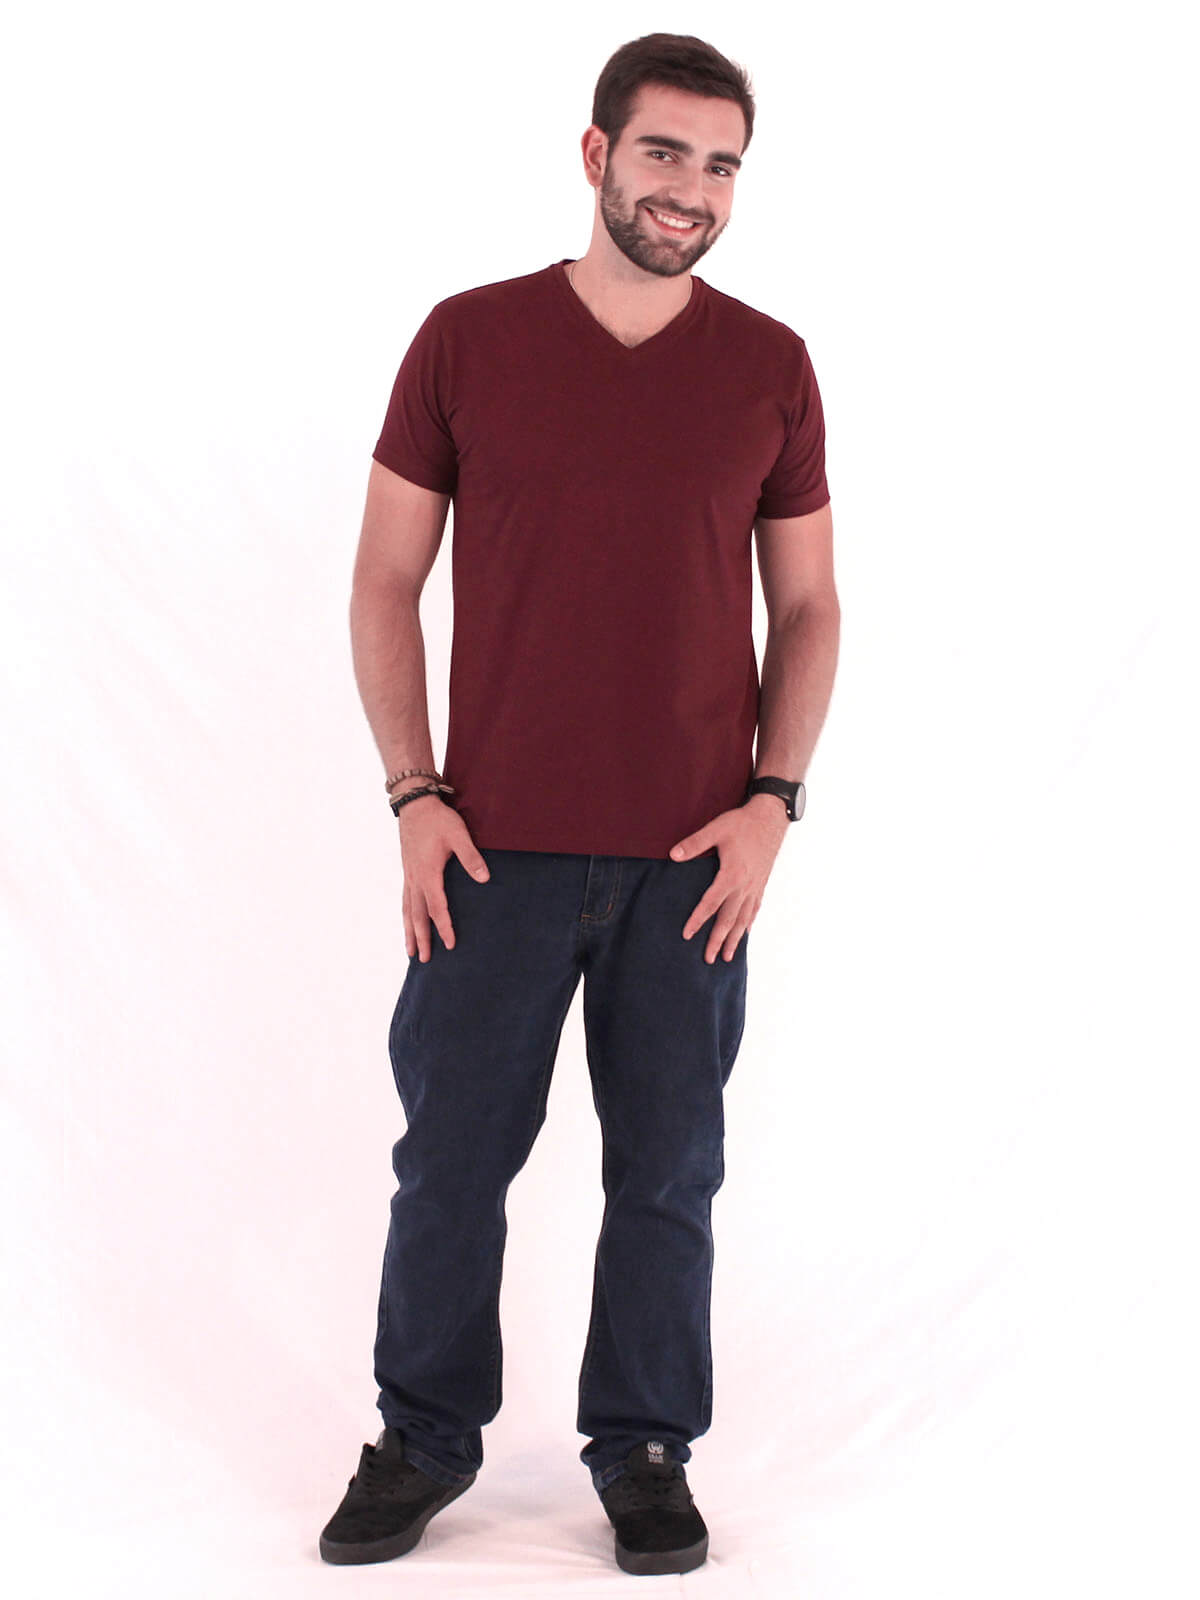 Camiseta Masculina Decote V. Algodão Slim Fit Lisa Bordo